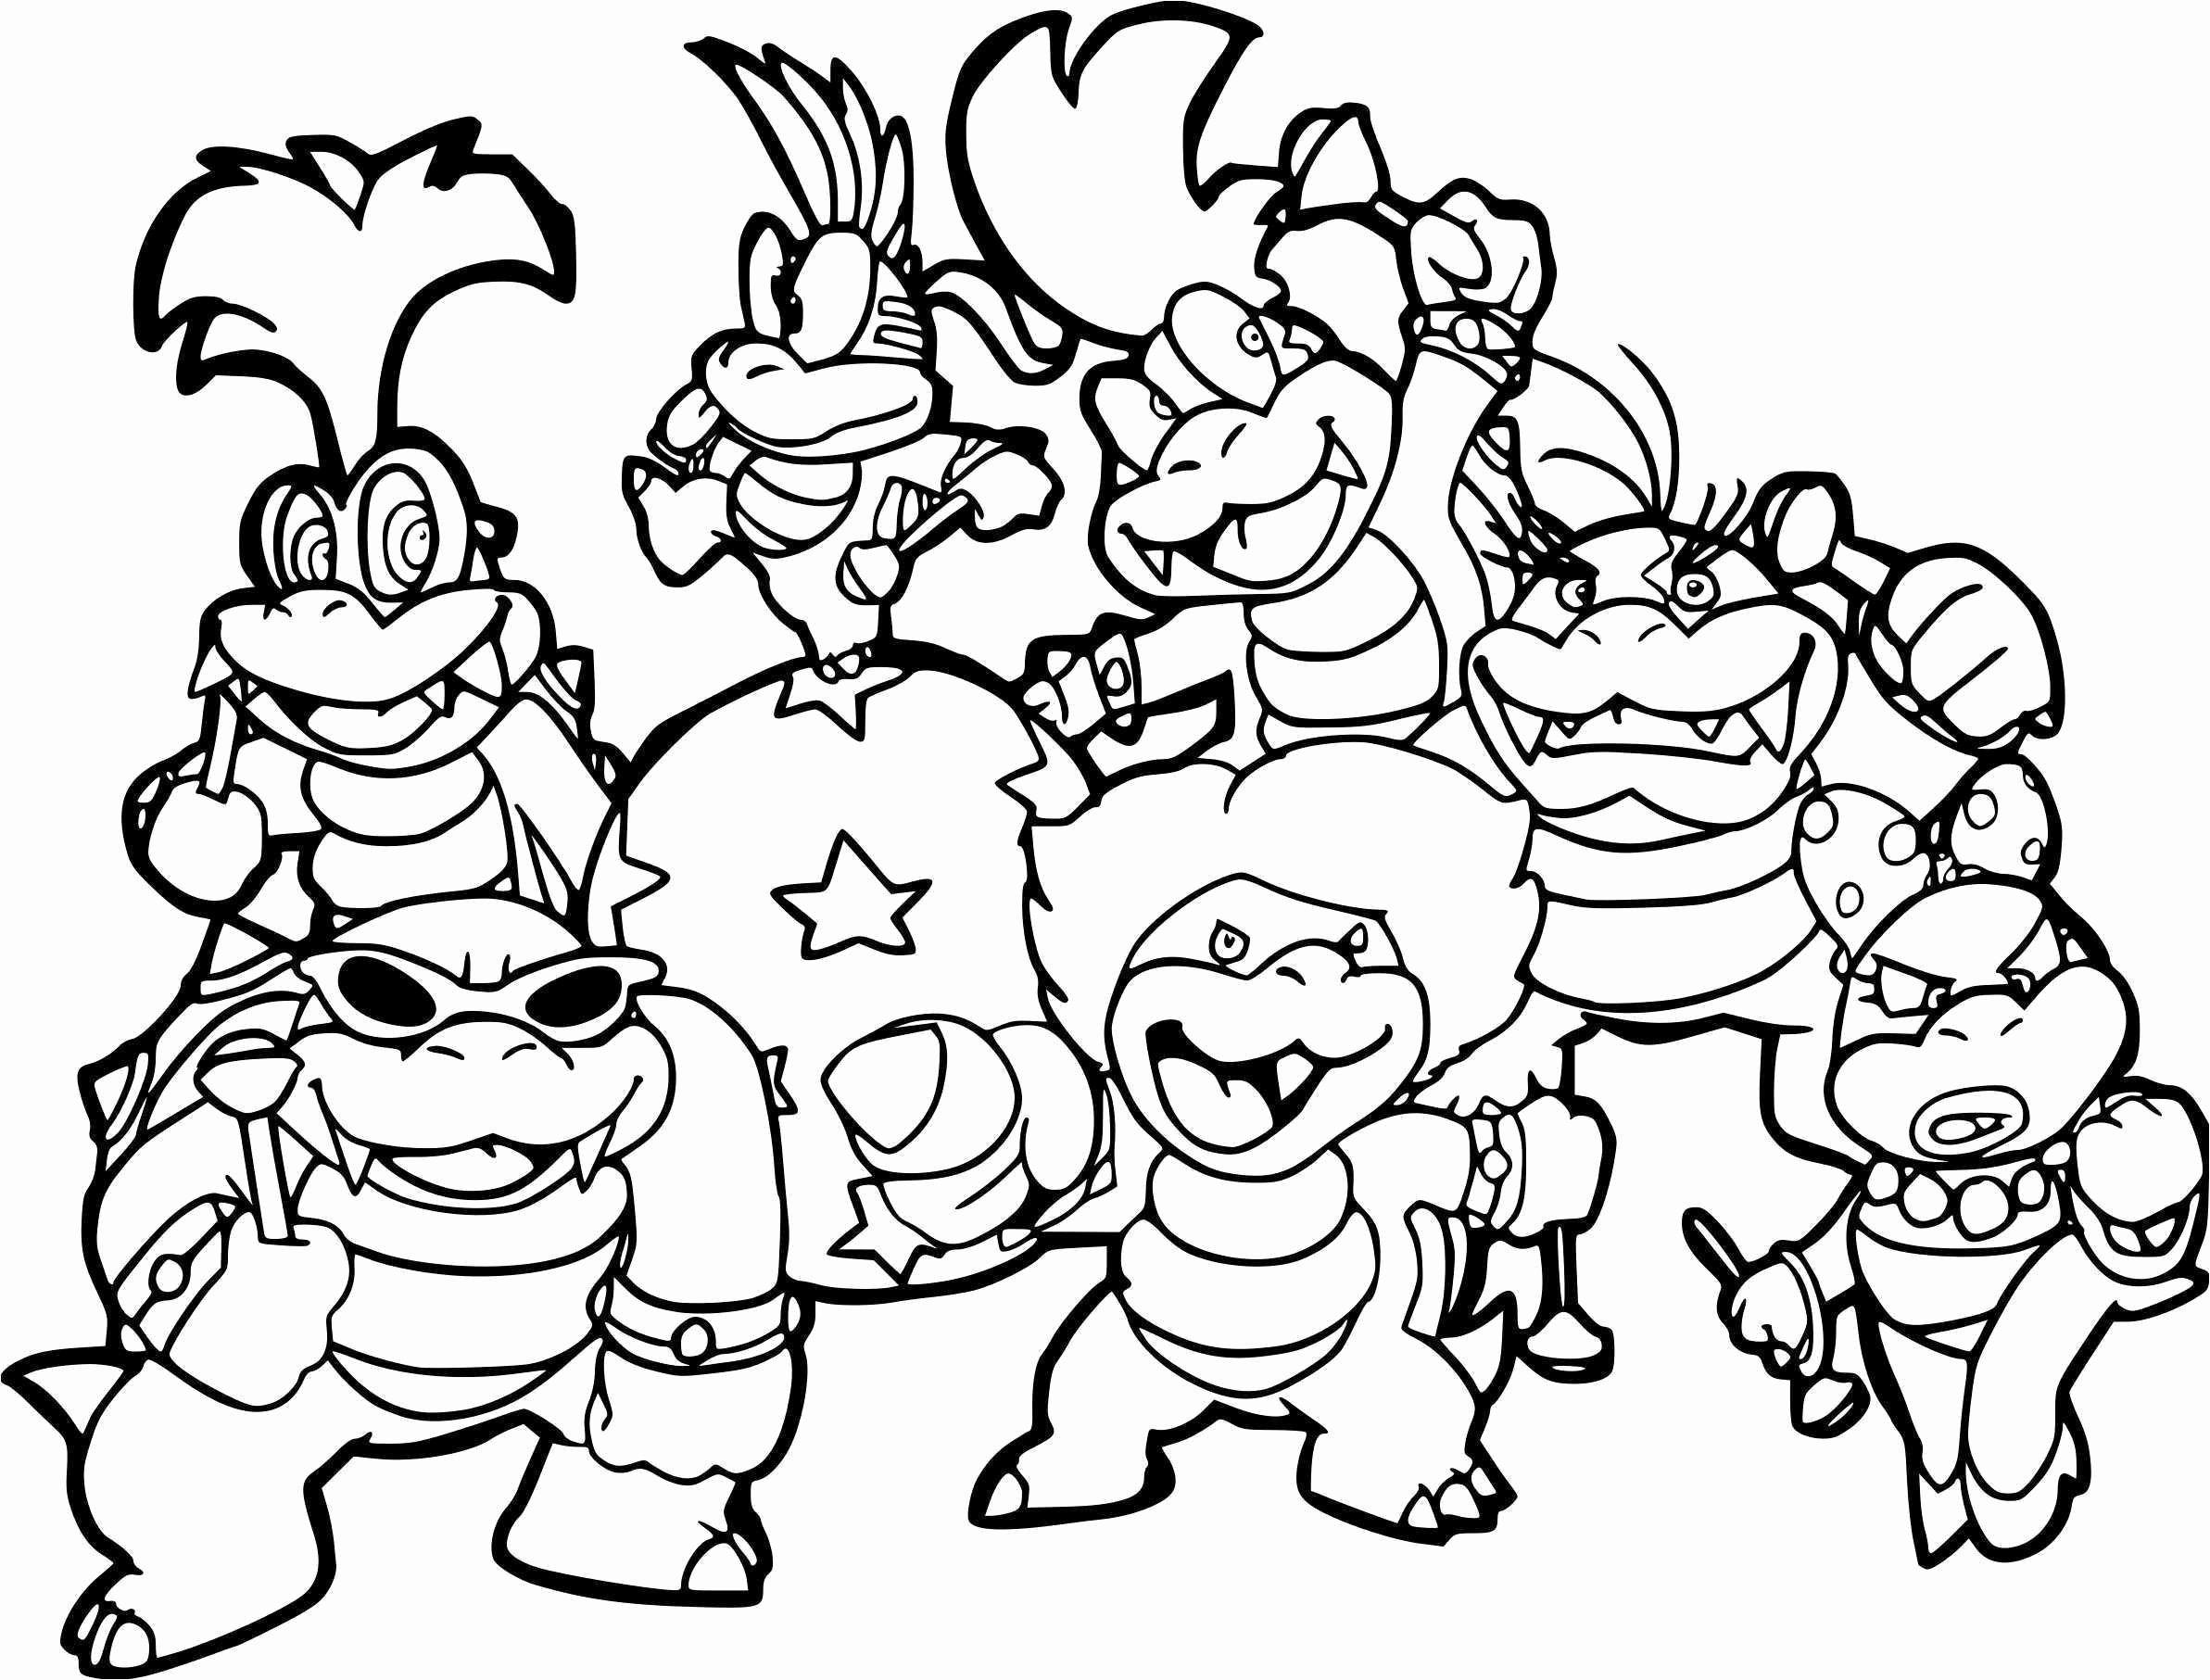 Drawing Book For Faces Beautiful Livre De Coloriage Ghostbusters Censorpia Super Mario Coloring Pages Mario Coloring Pages Cartoon Coloring Pages